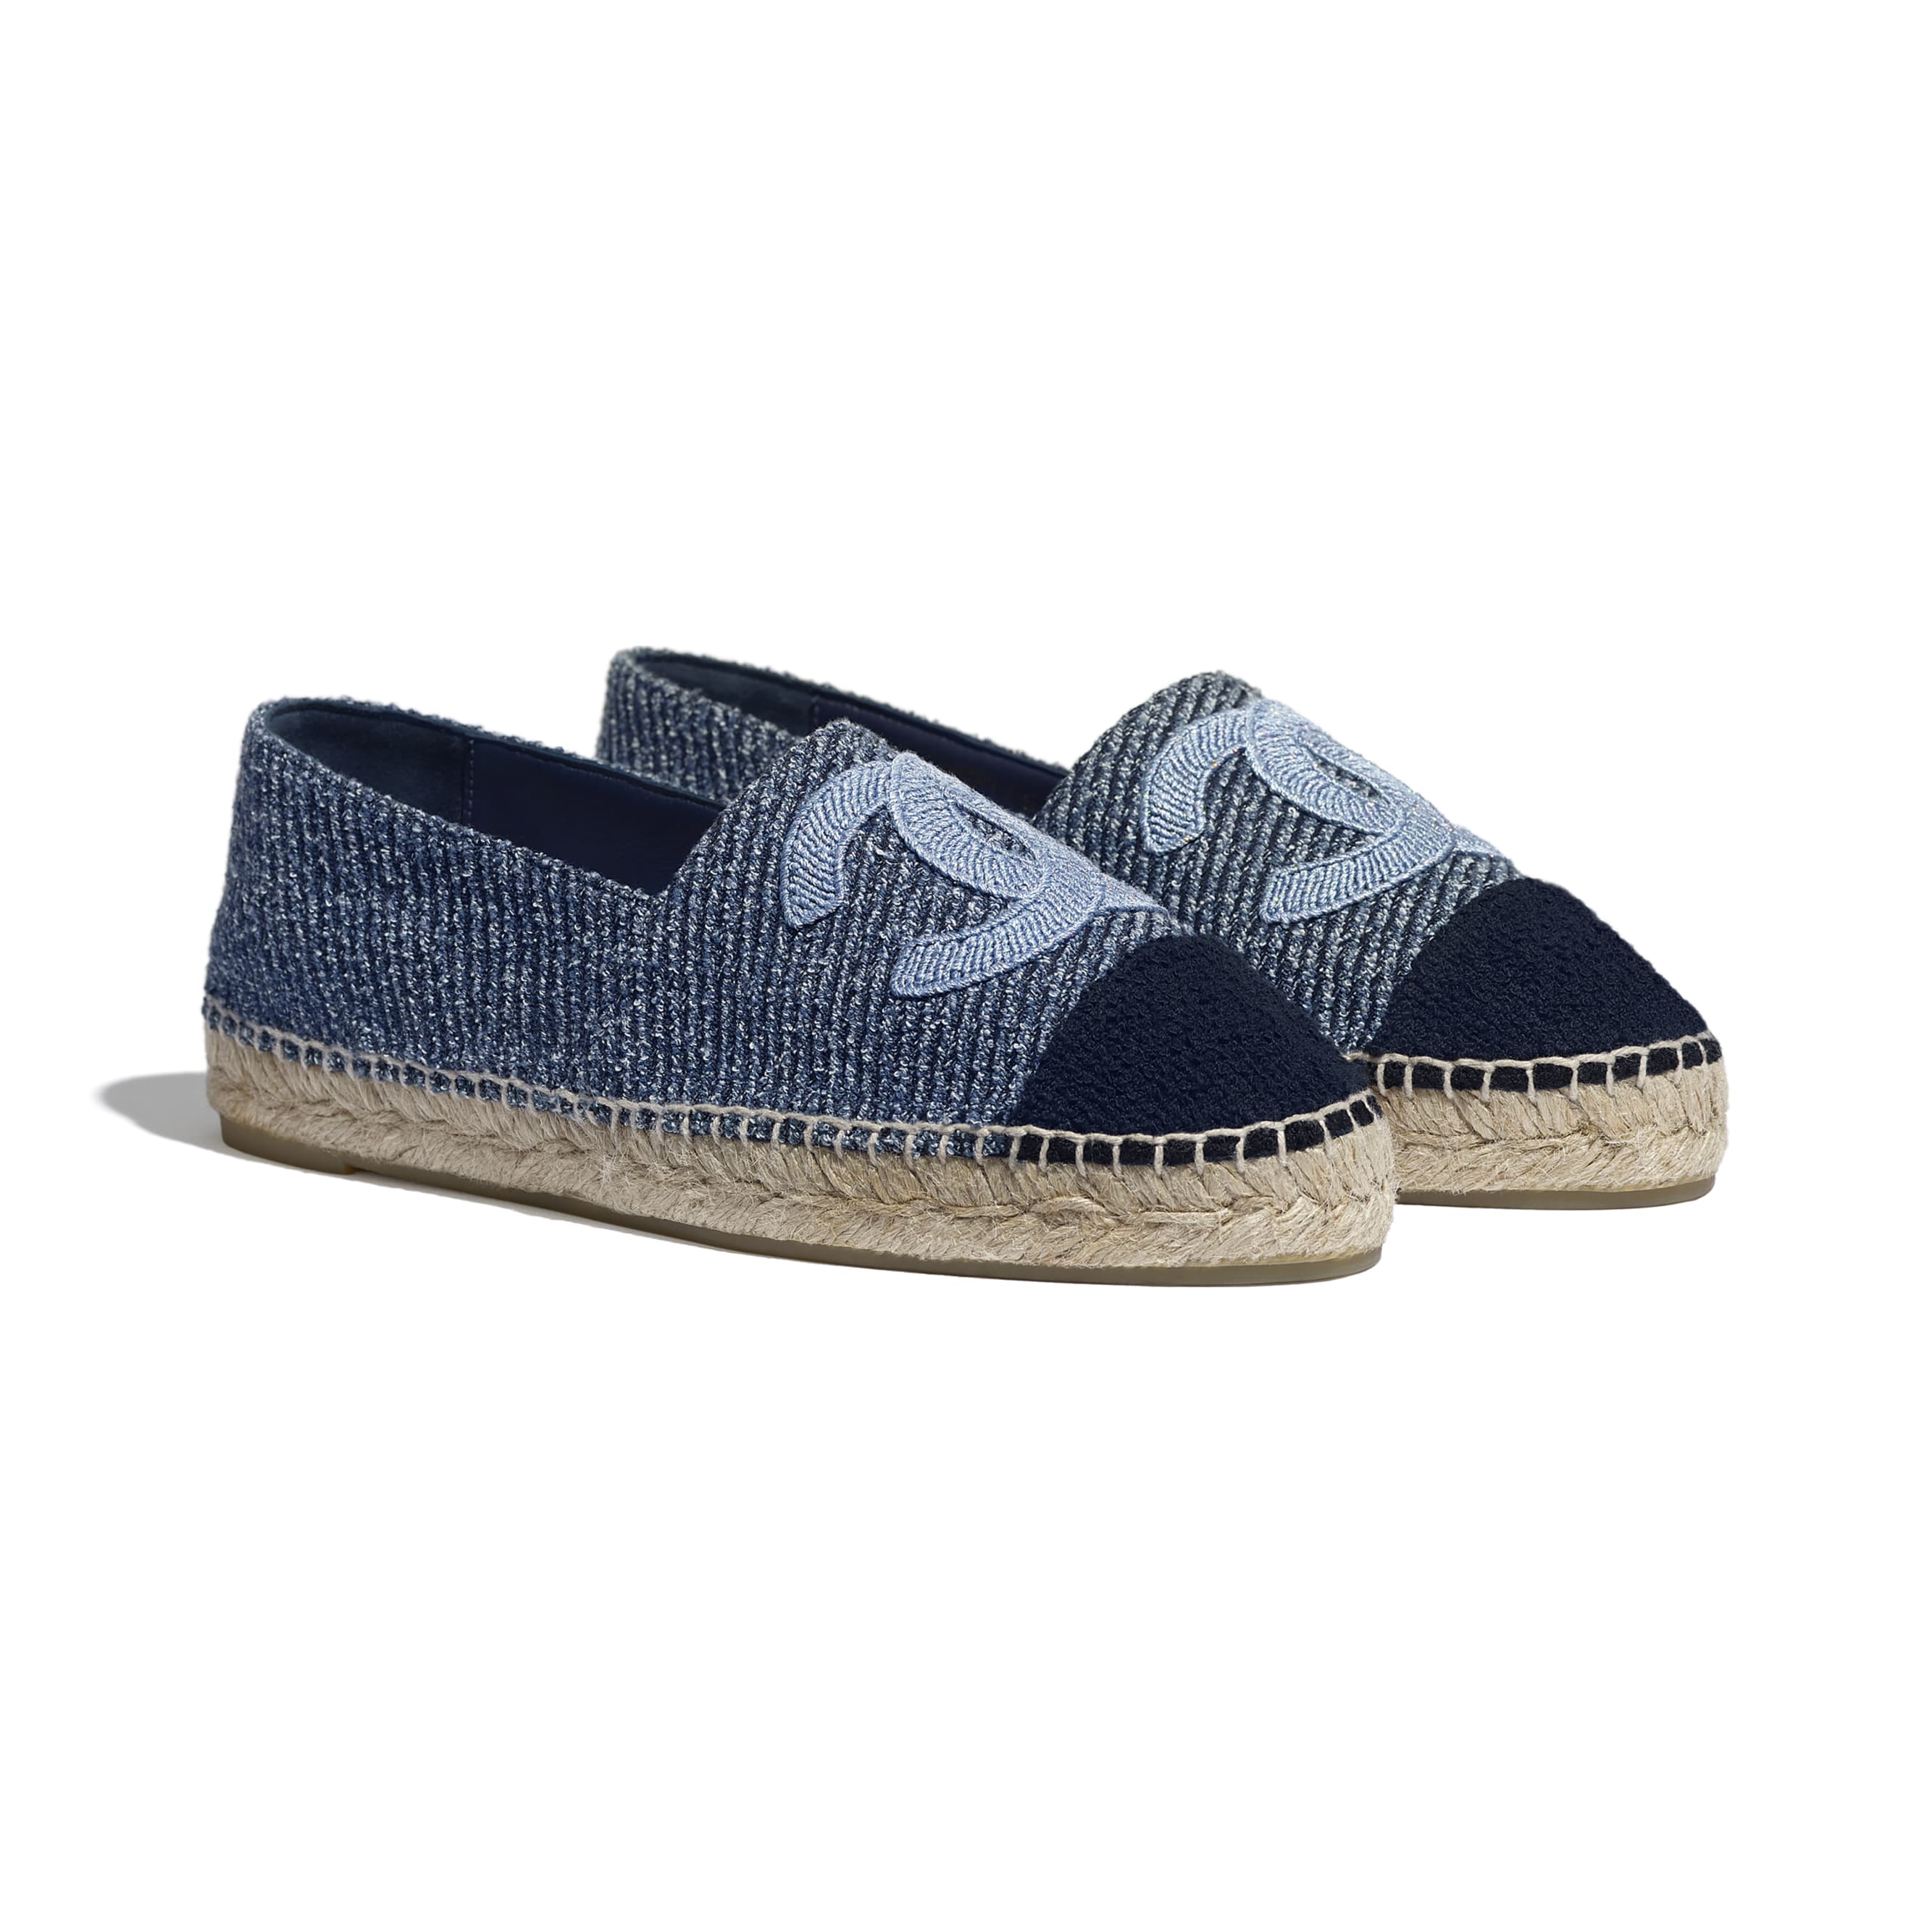 Espadrilles - Blue, Ecru & Black - Cotton Tweed - CHANEL - Alternative view - see standard sized version